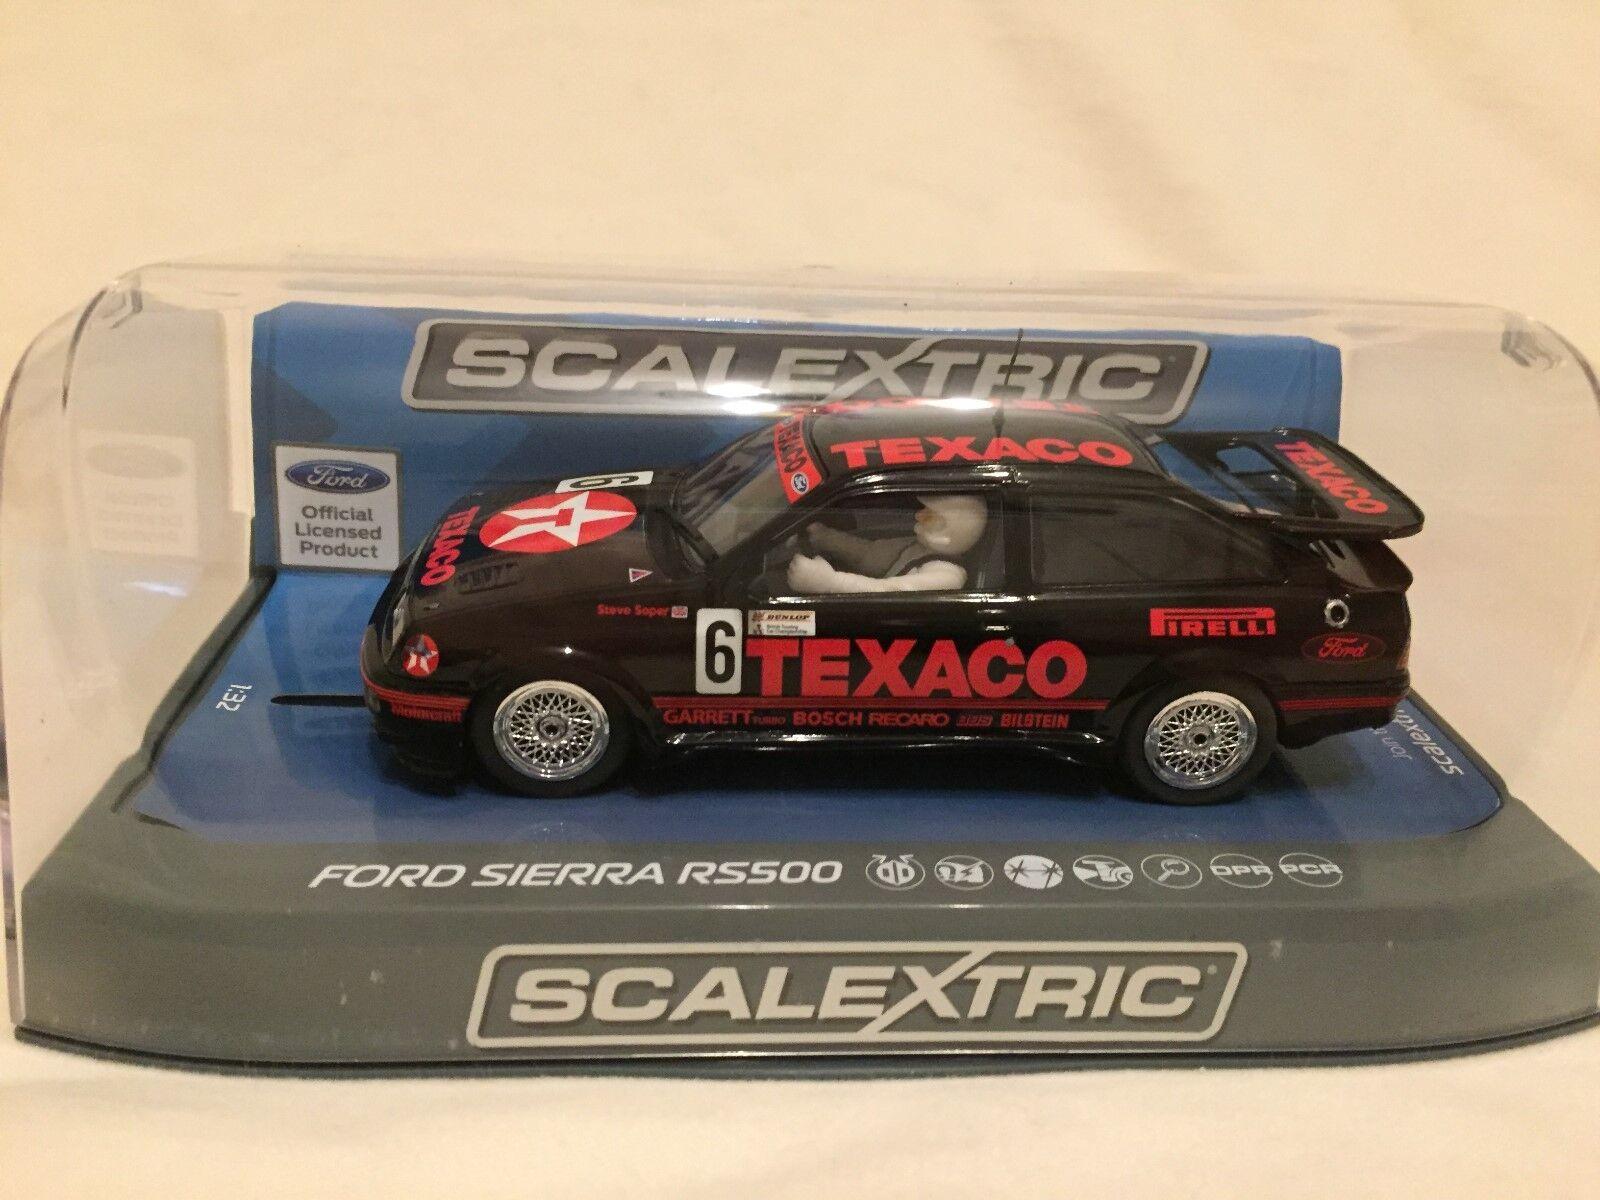 Brand New Scalextric Ford Sierra Cosworth RS500 Texaco Steve Soper C3738 No6